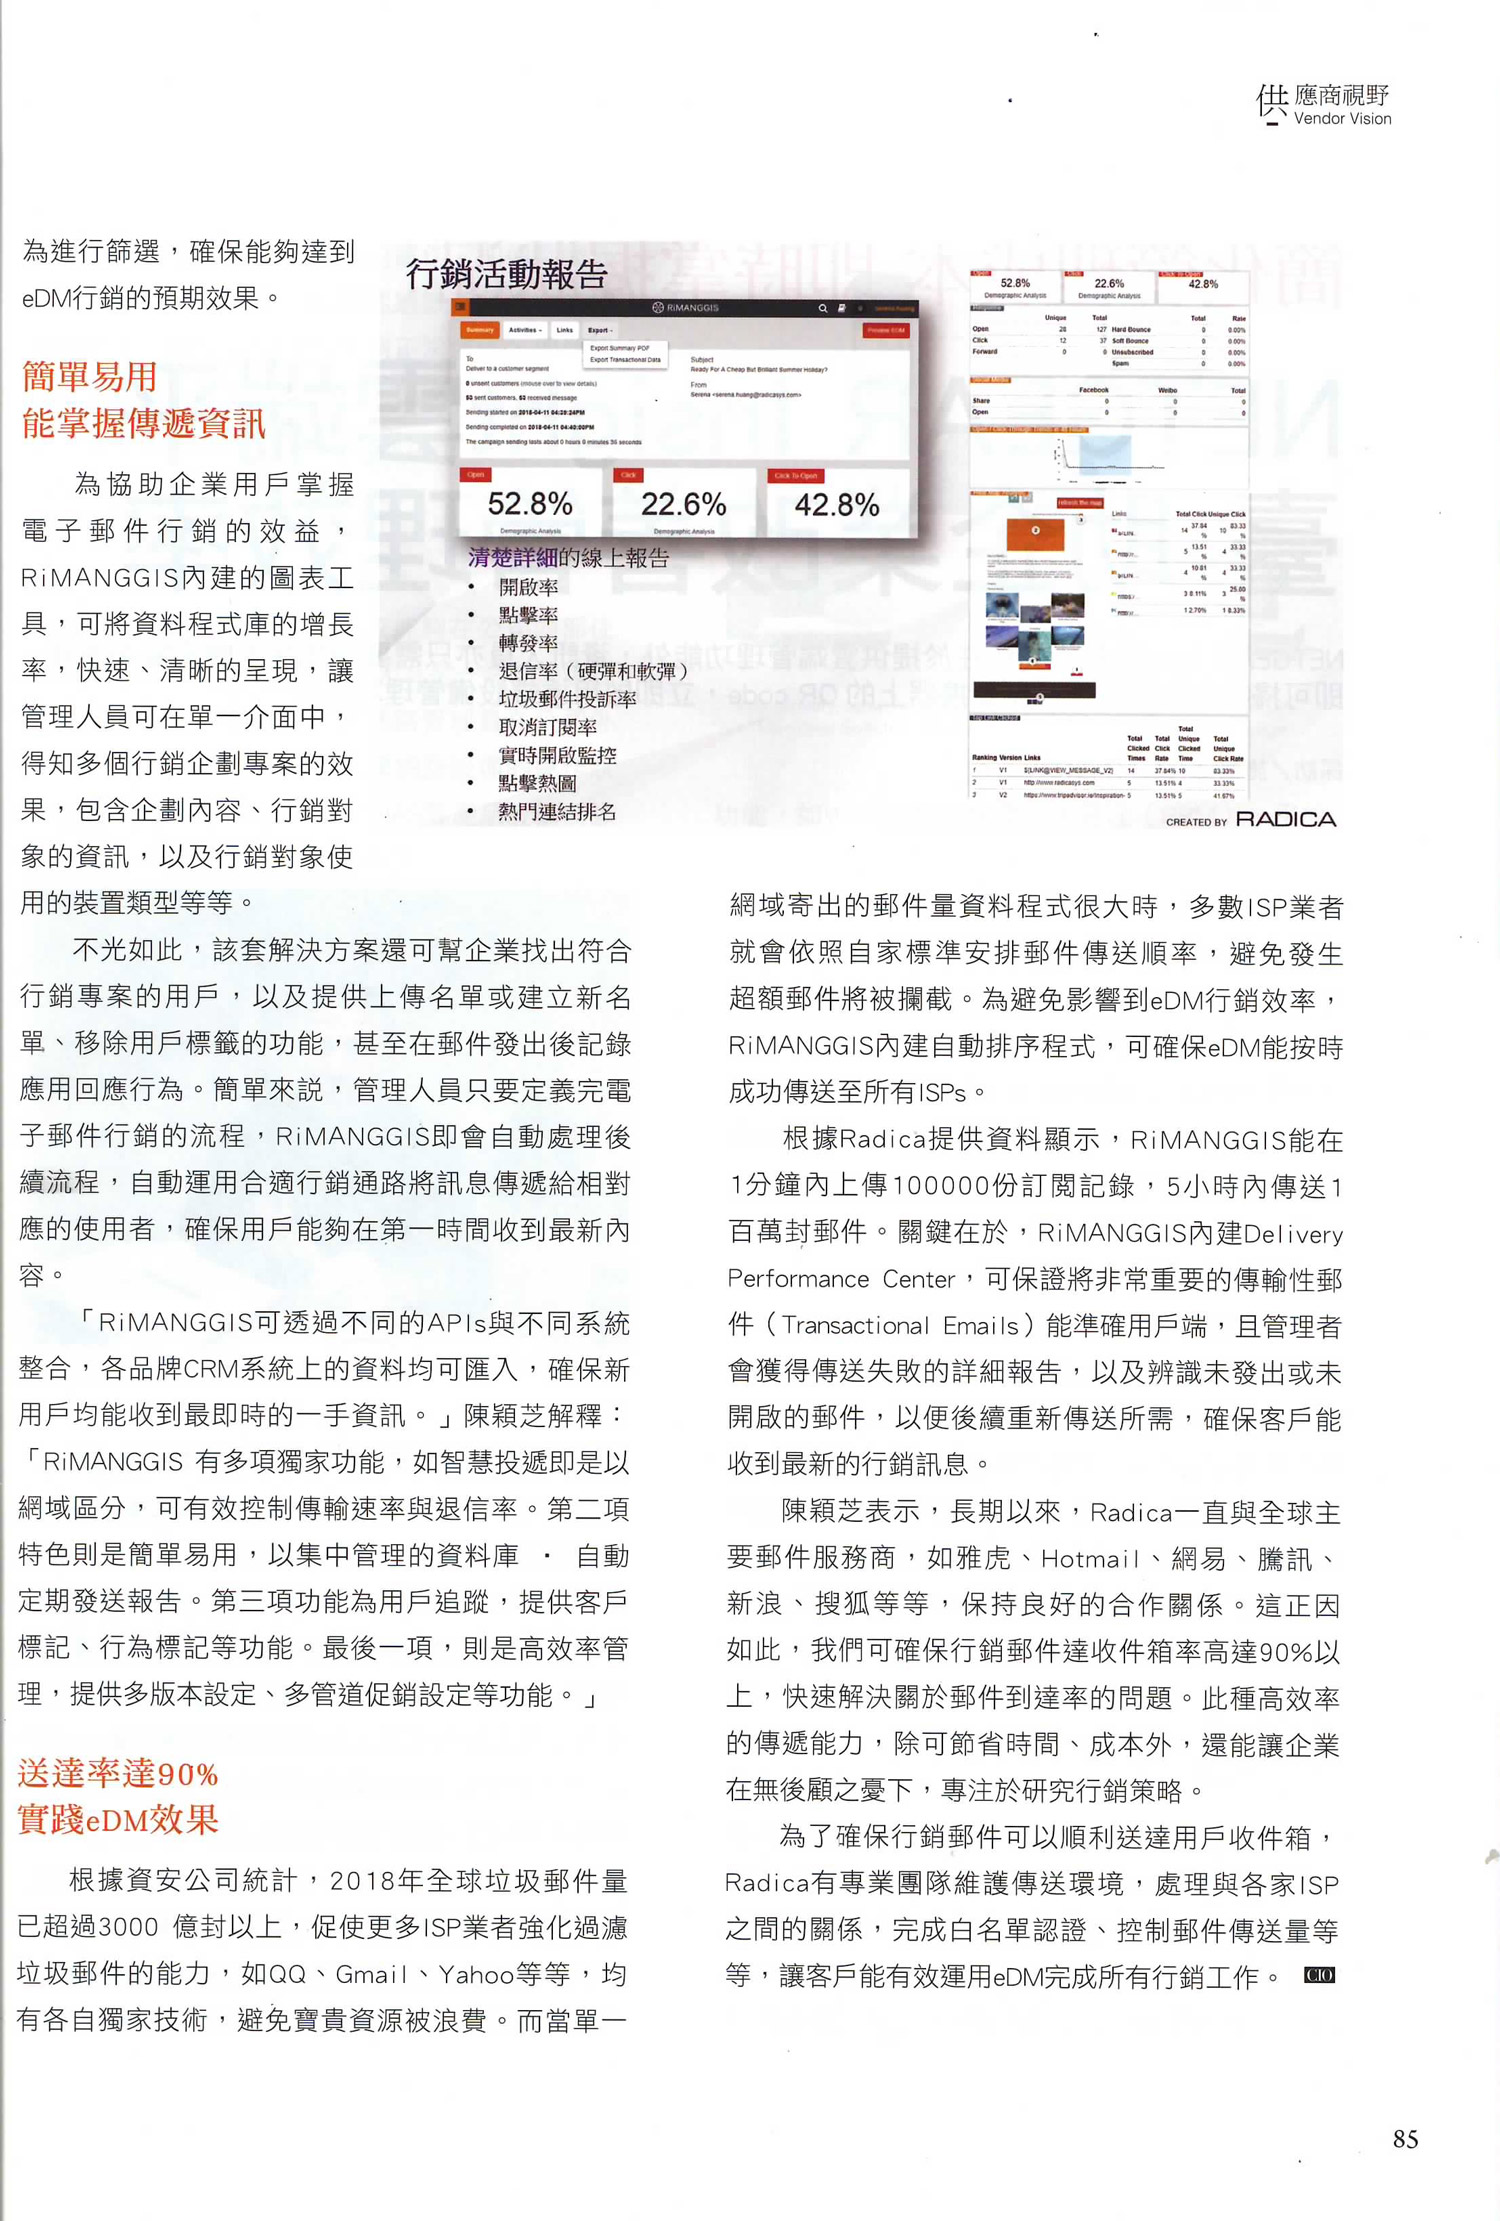 Taiwan Press release - 2.jpg